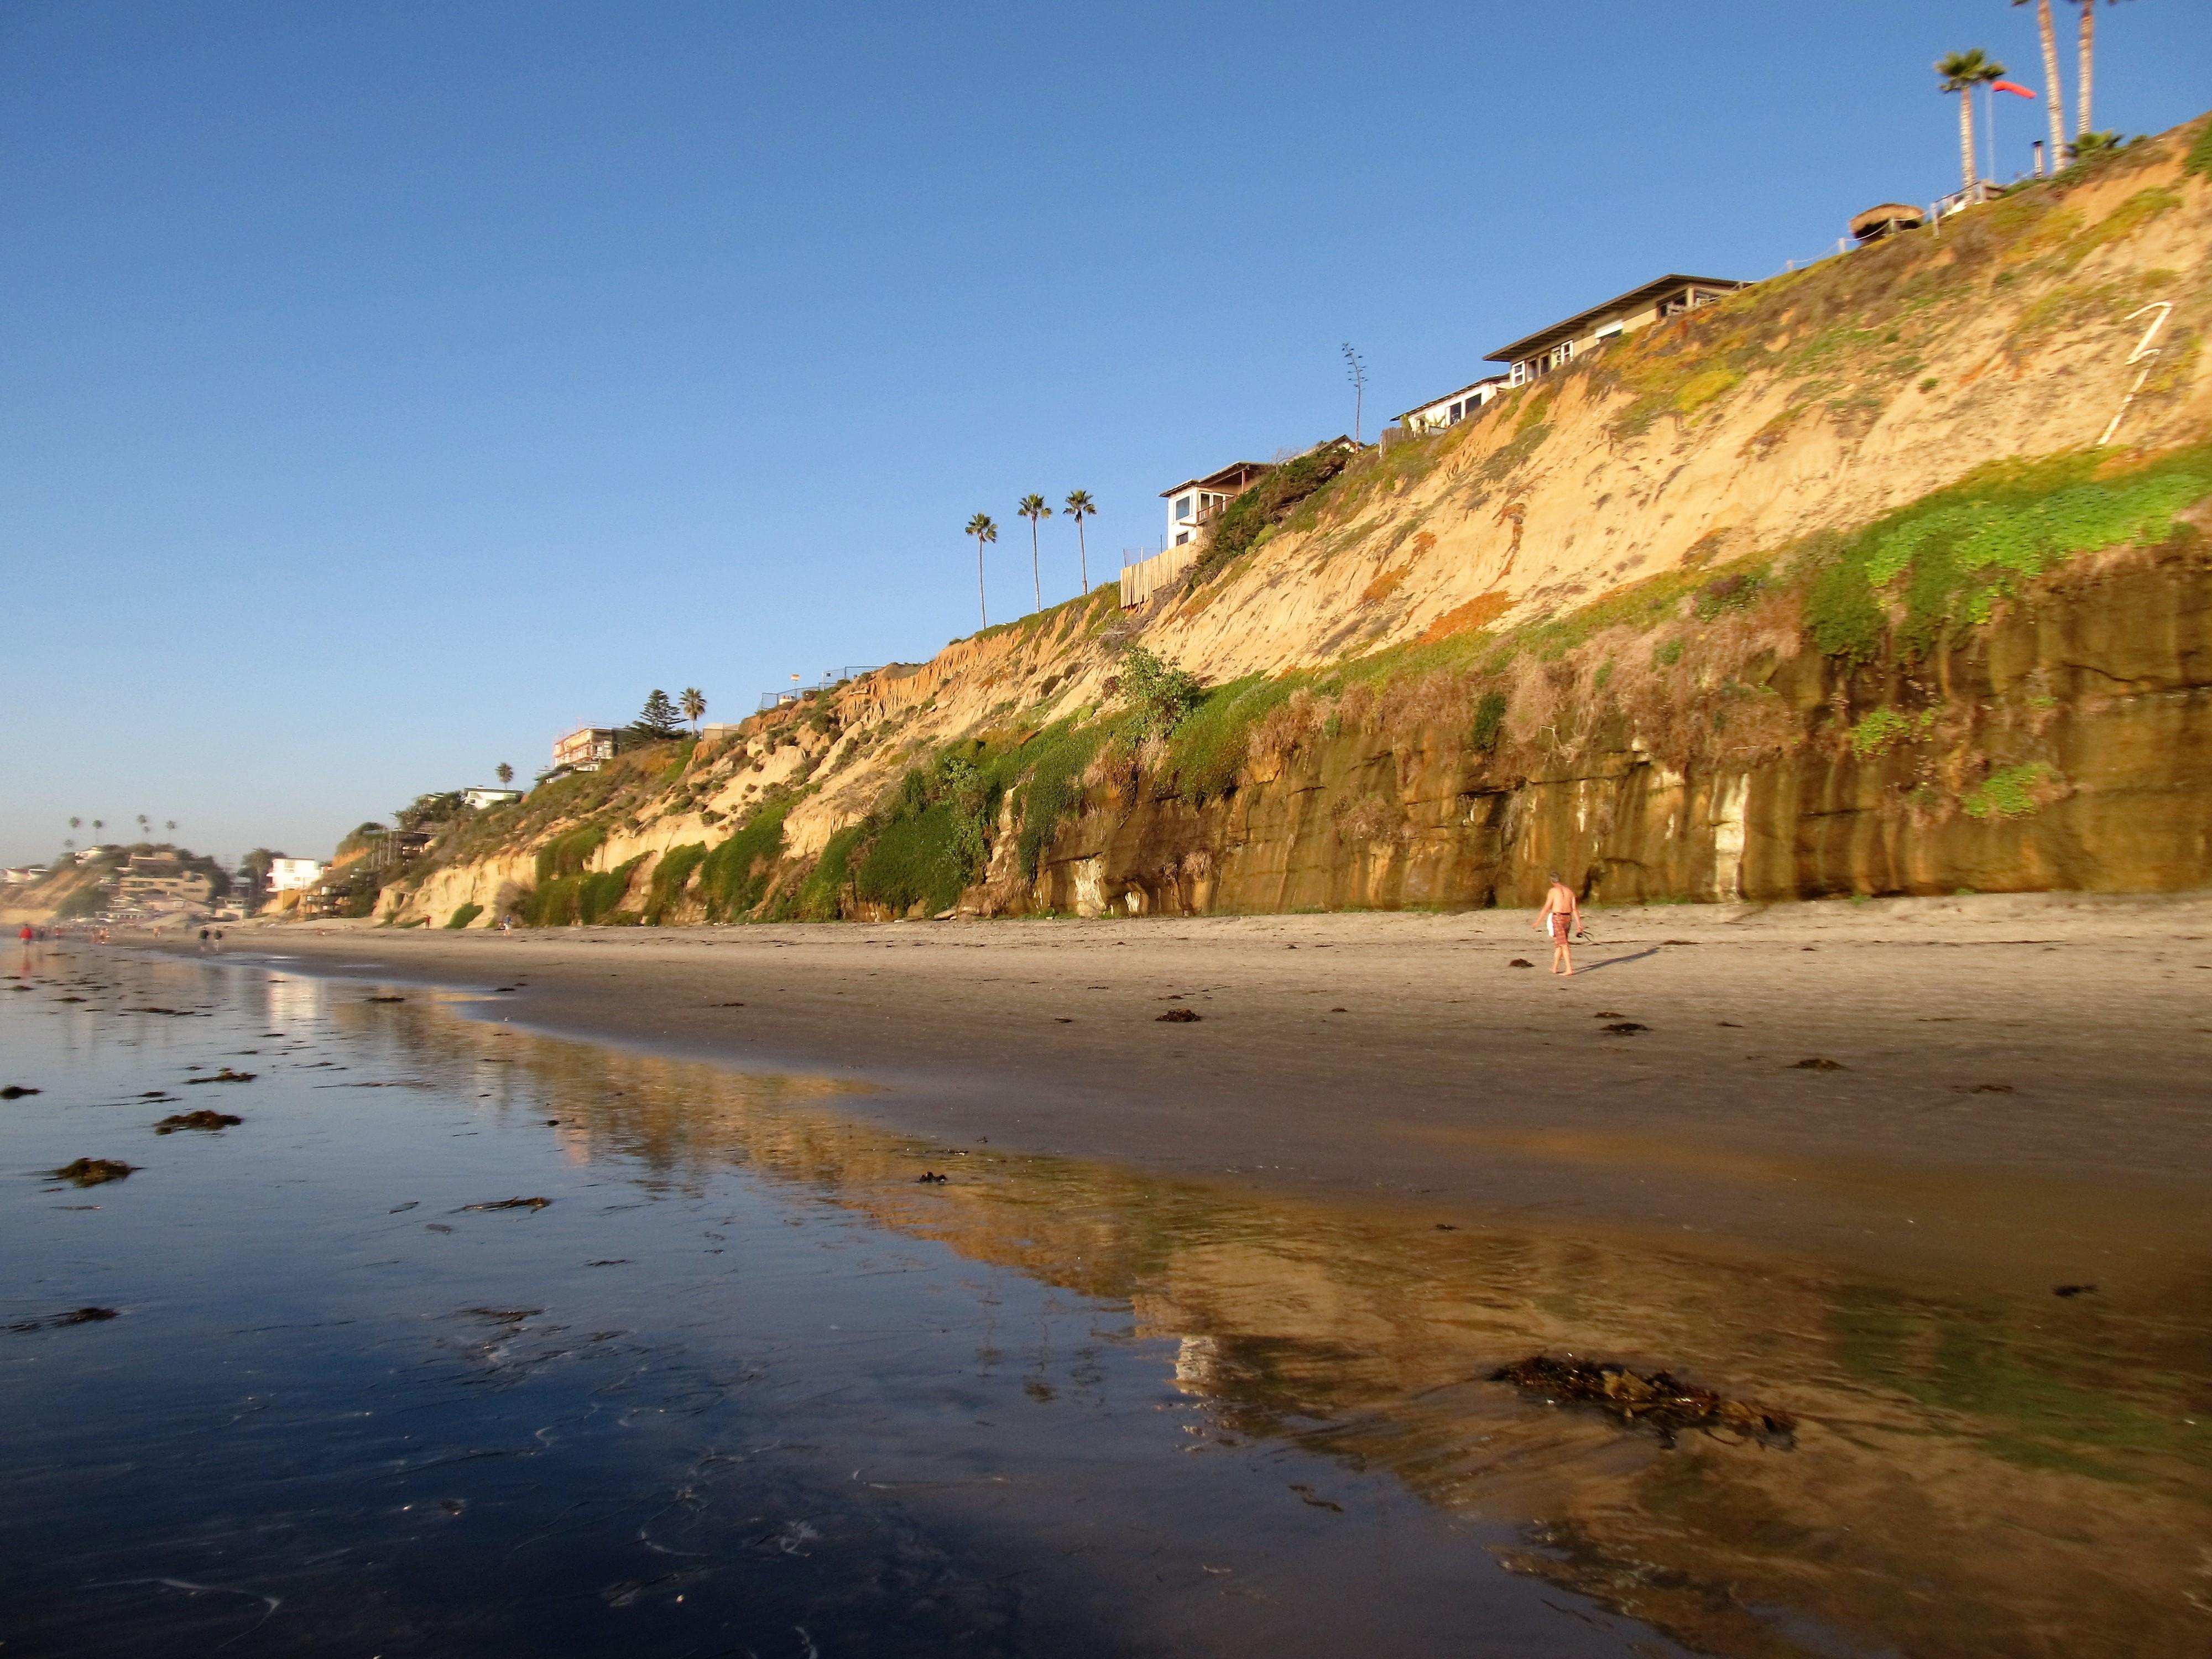 Boneyard Beach, Encinitas, CA - California Beaches